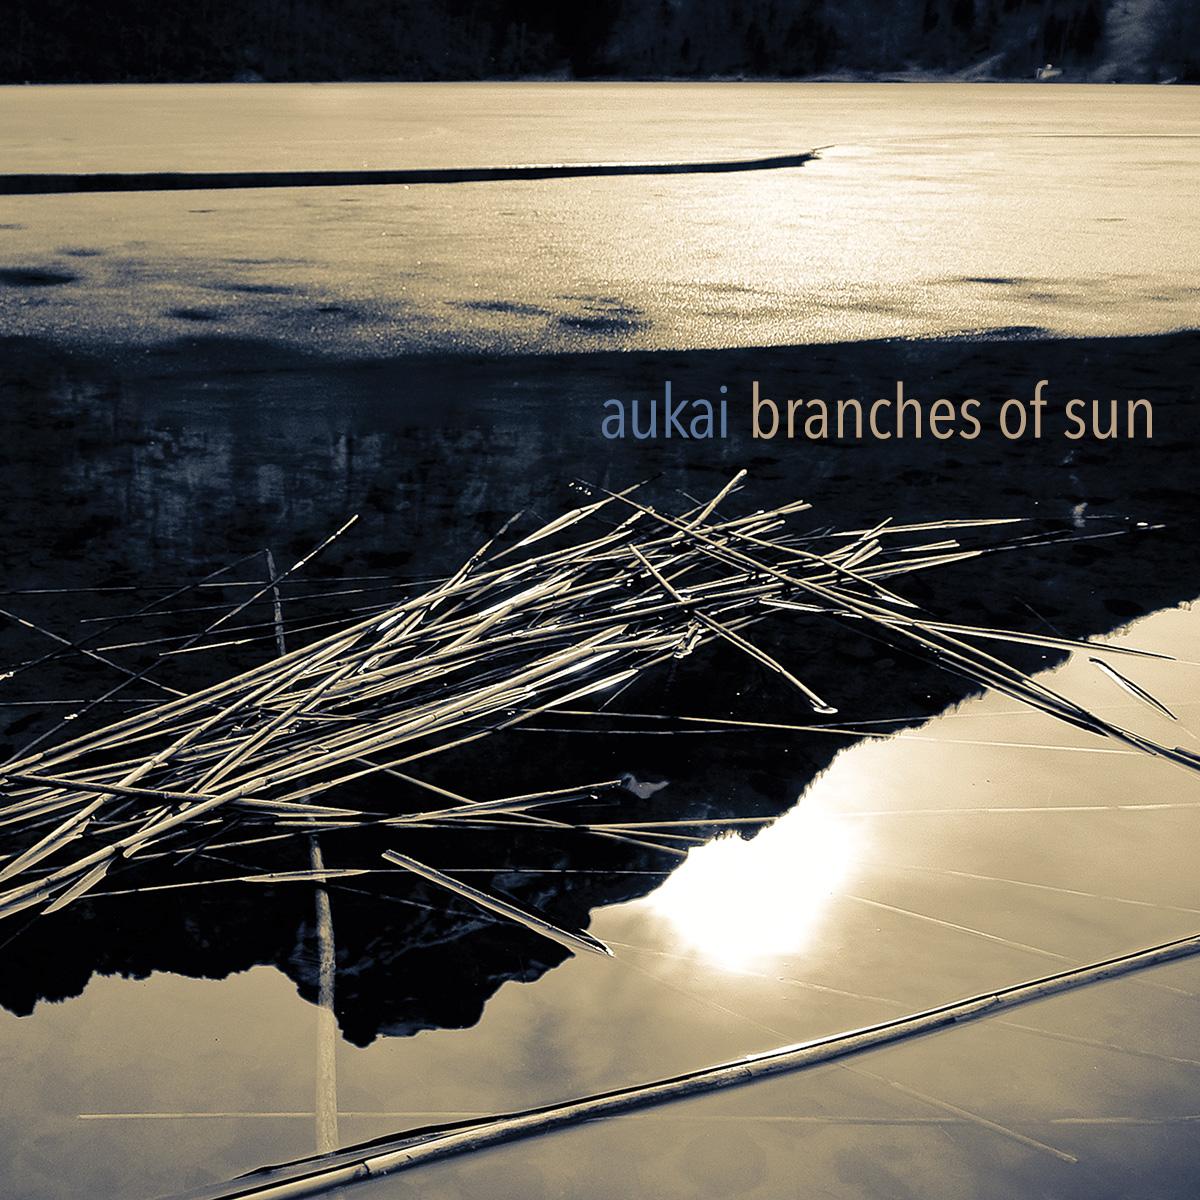 aukai_branches_of_sun_cover_1200x1200.jpg